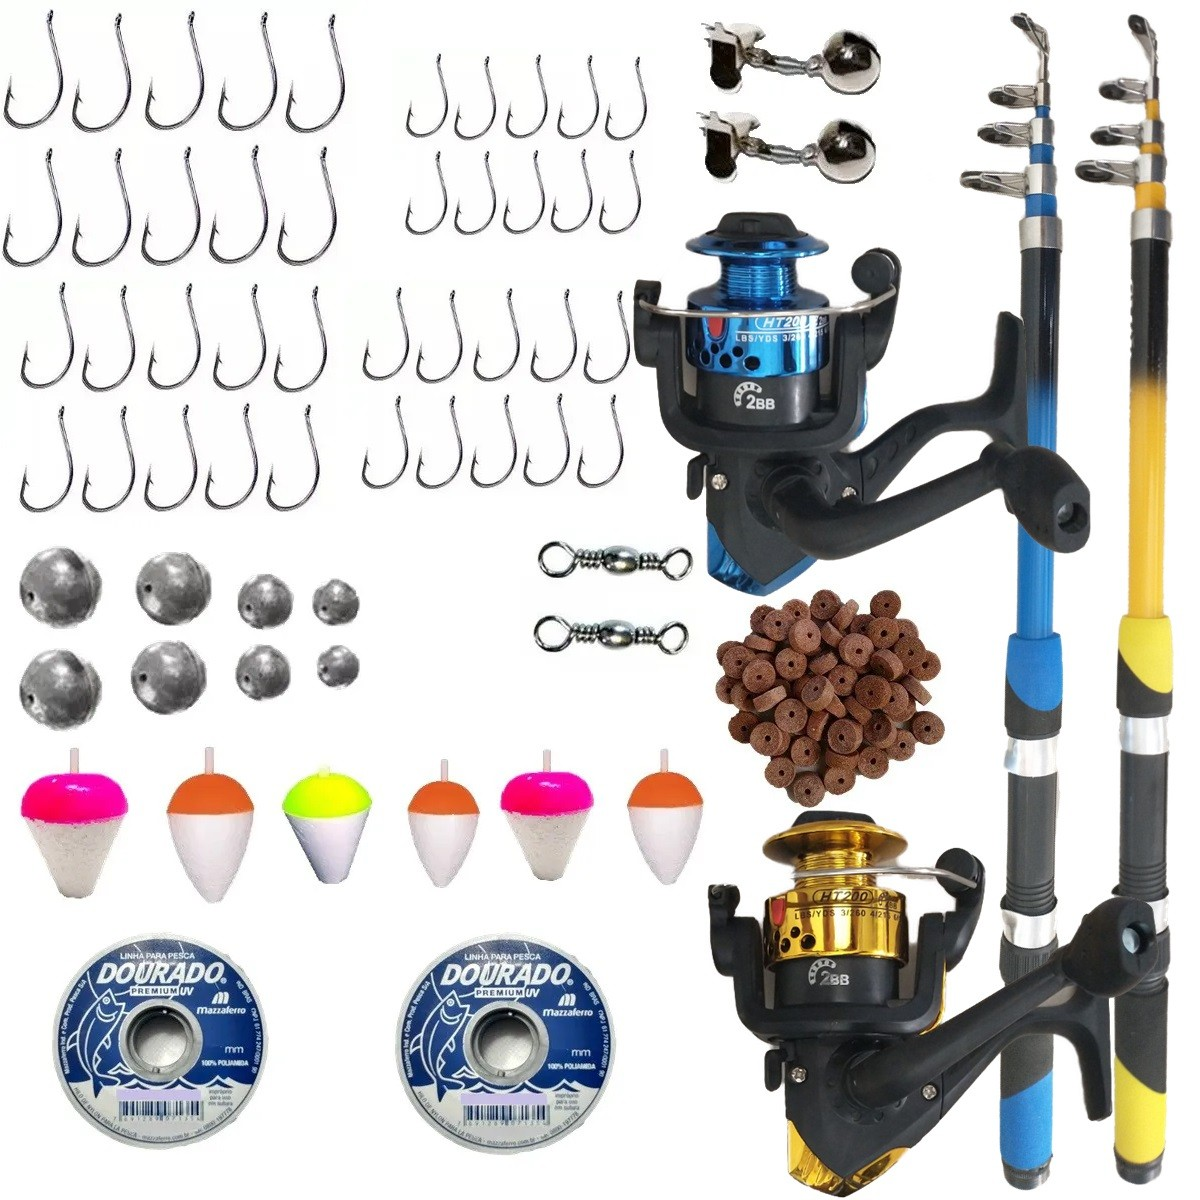 Kit De Pesca Pescaria Completa 2 Vara 2 Molinete E Itens